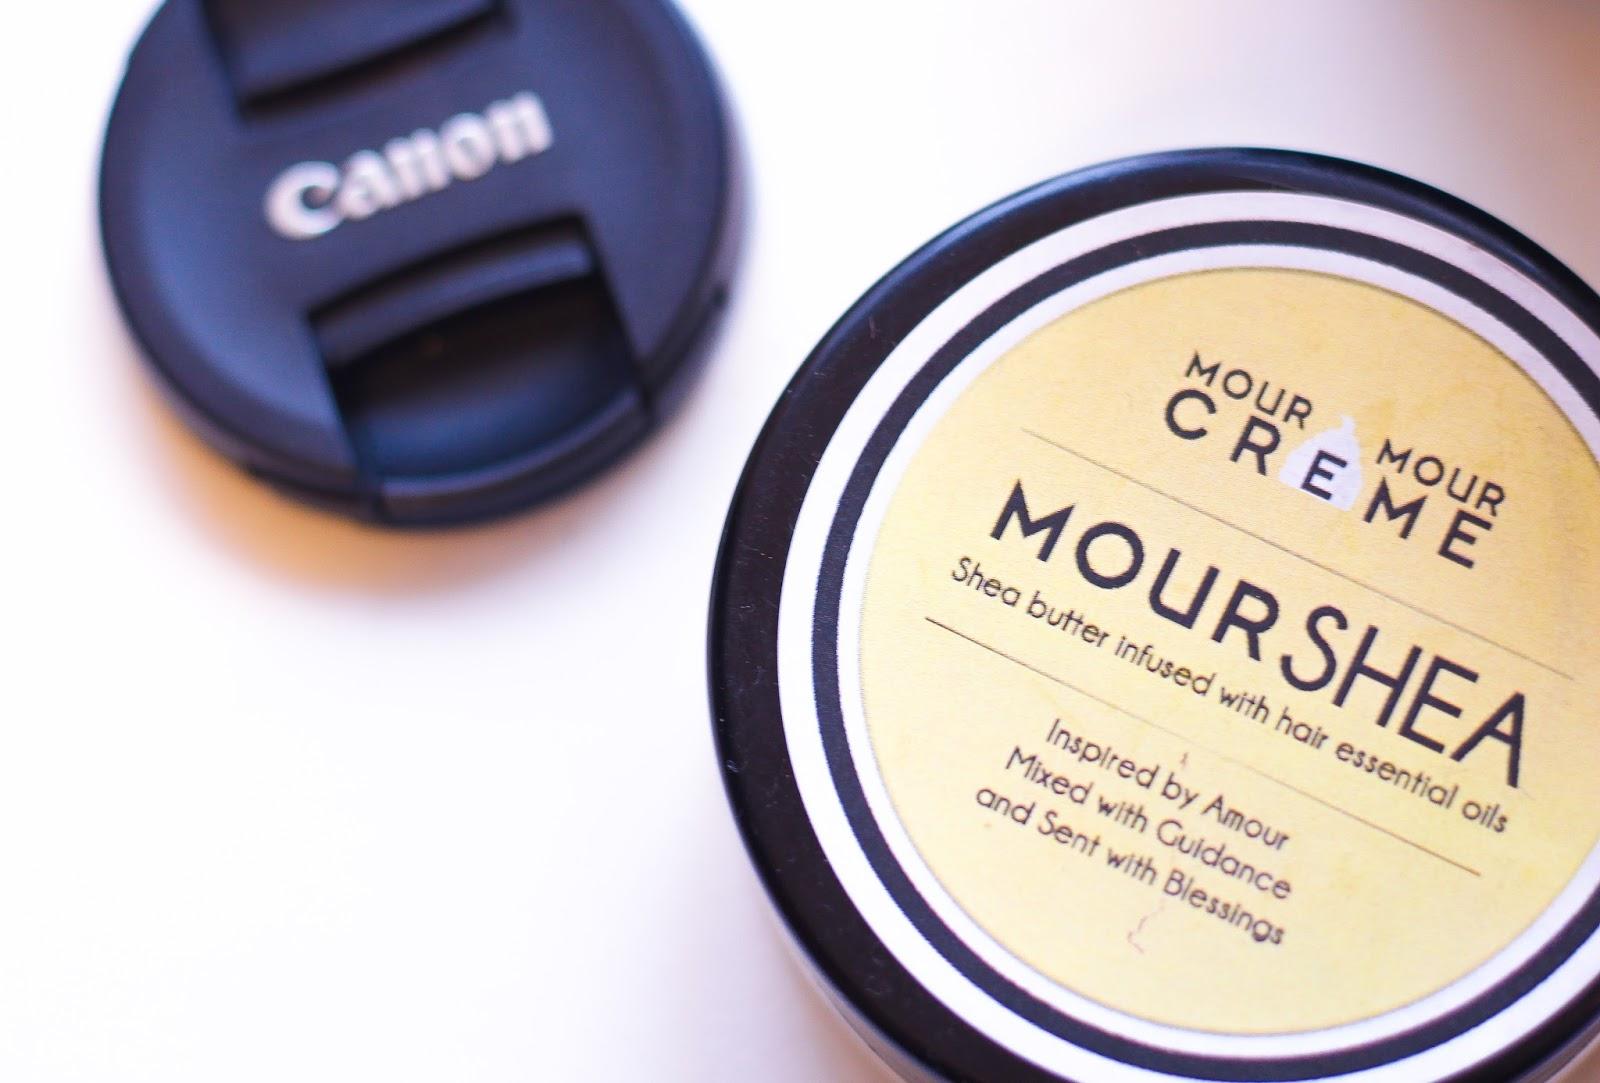 Elizabeth Arden Eight Hour Cream, Garnier Micellar Water, Pixi Glow Tonic, Urban Decay All Nighter Setting Spray